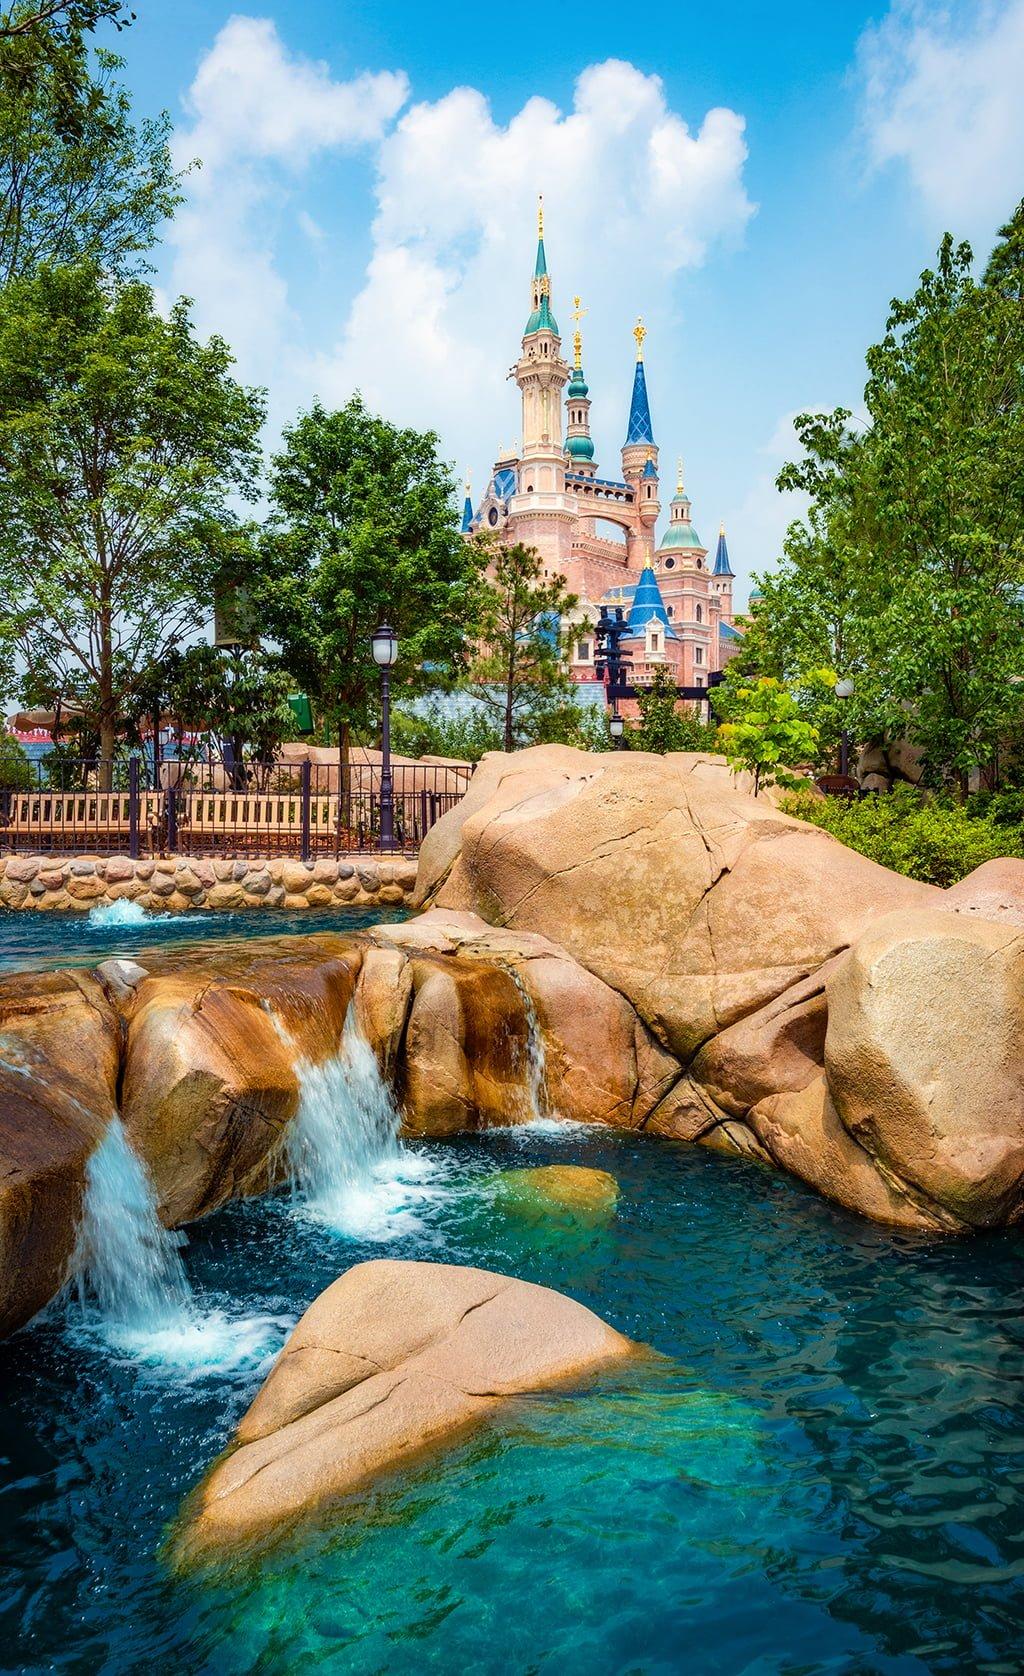 Best Shanghai Disneyland Attractions & Ride Guide - Disney ...